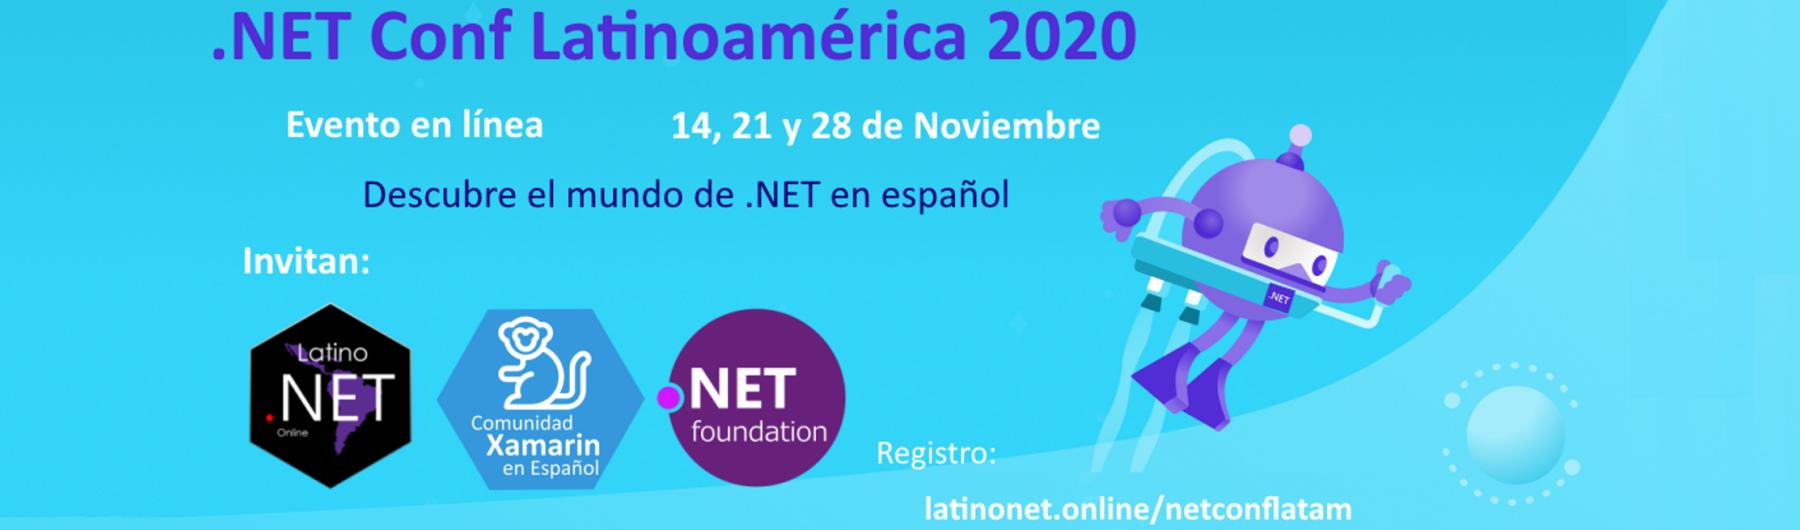 .NET Conf Latinoamérica 2020